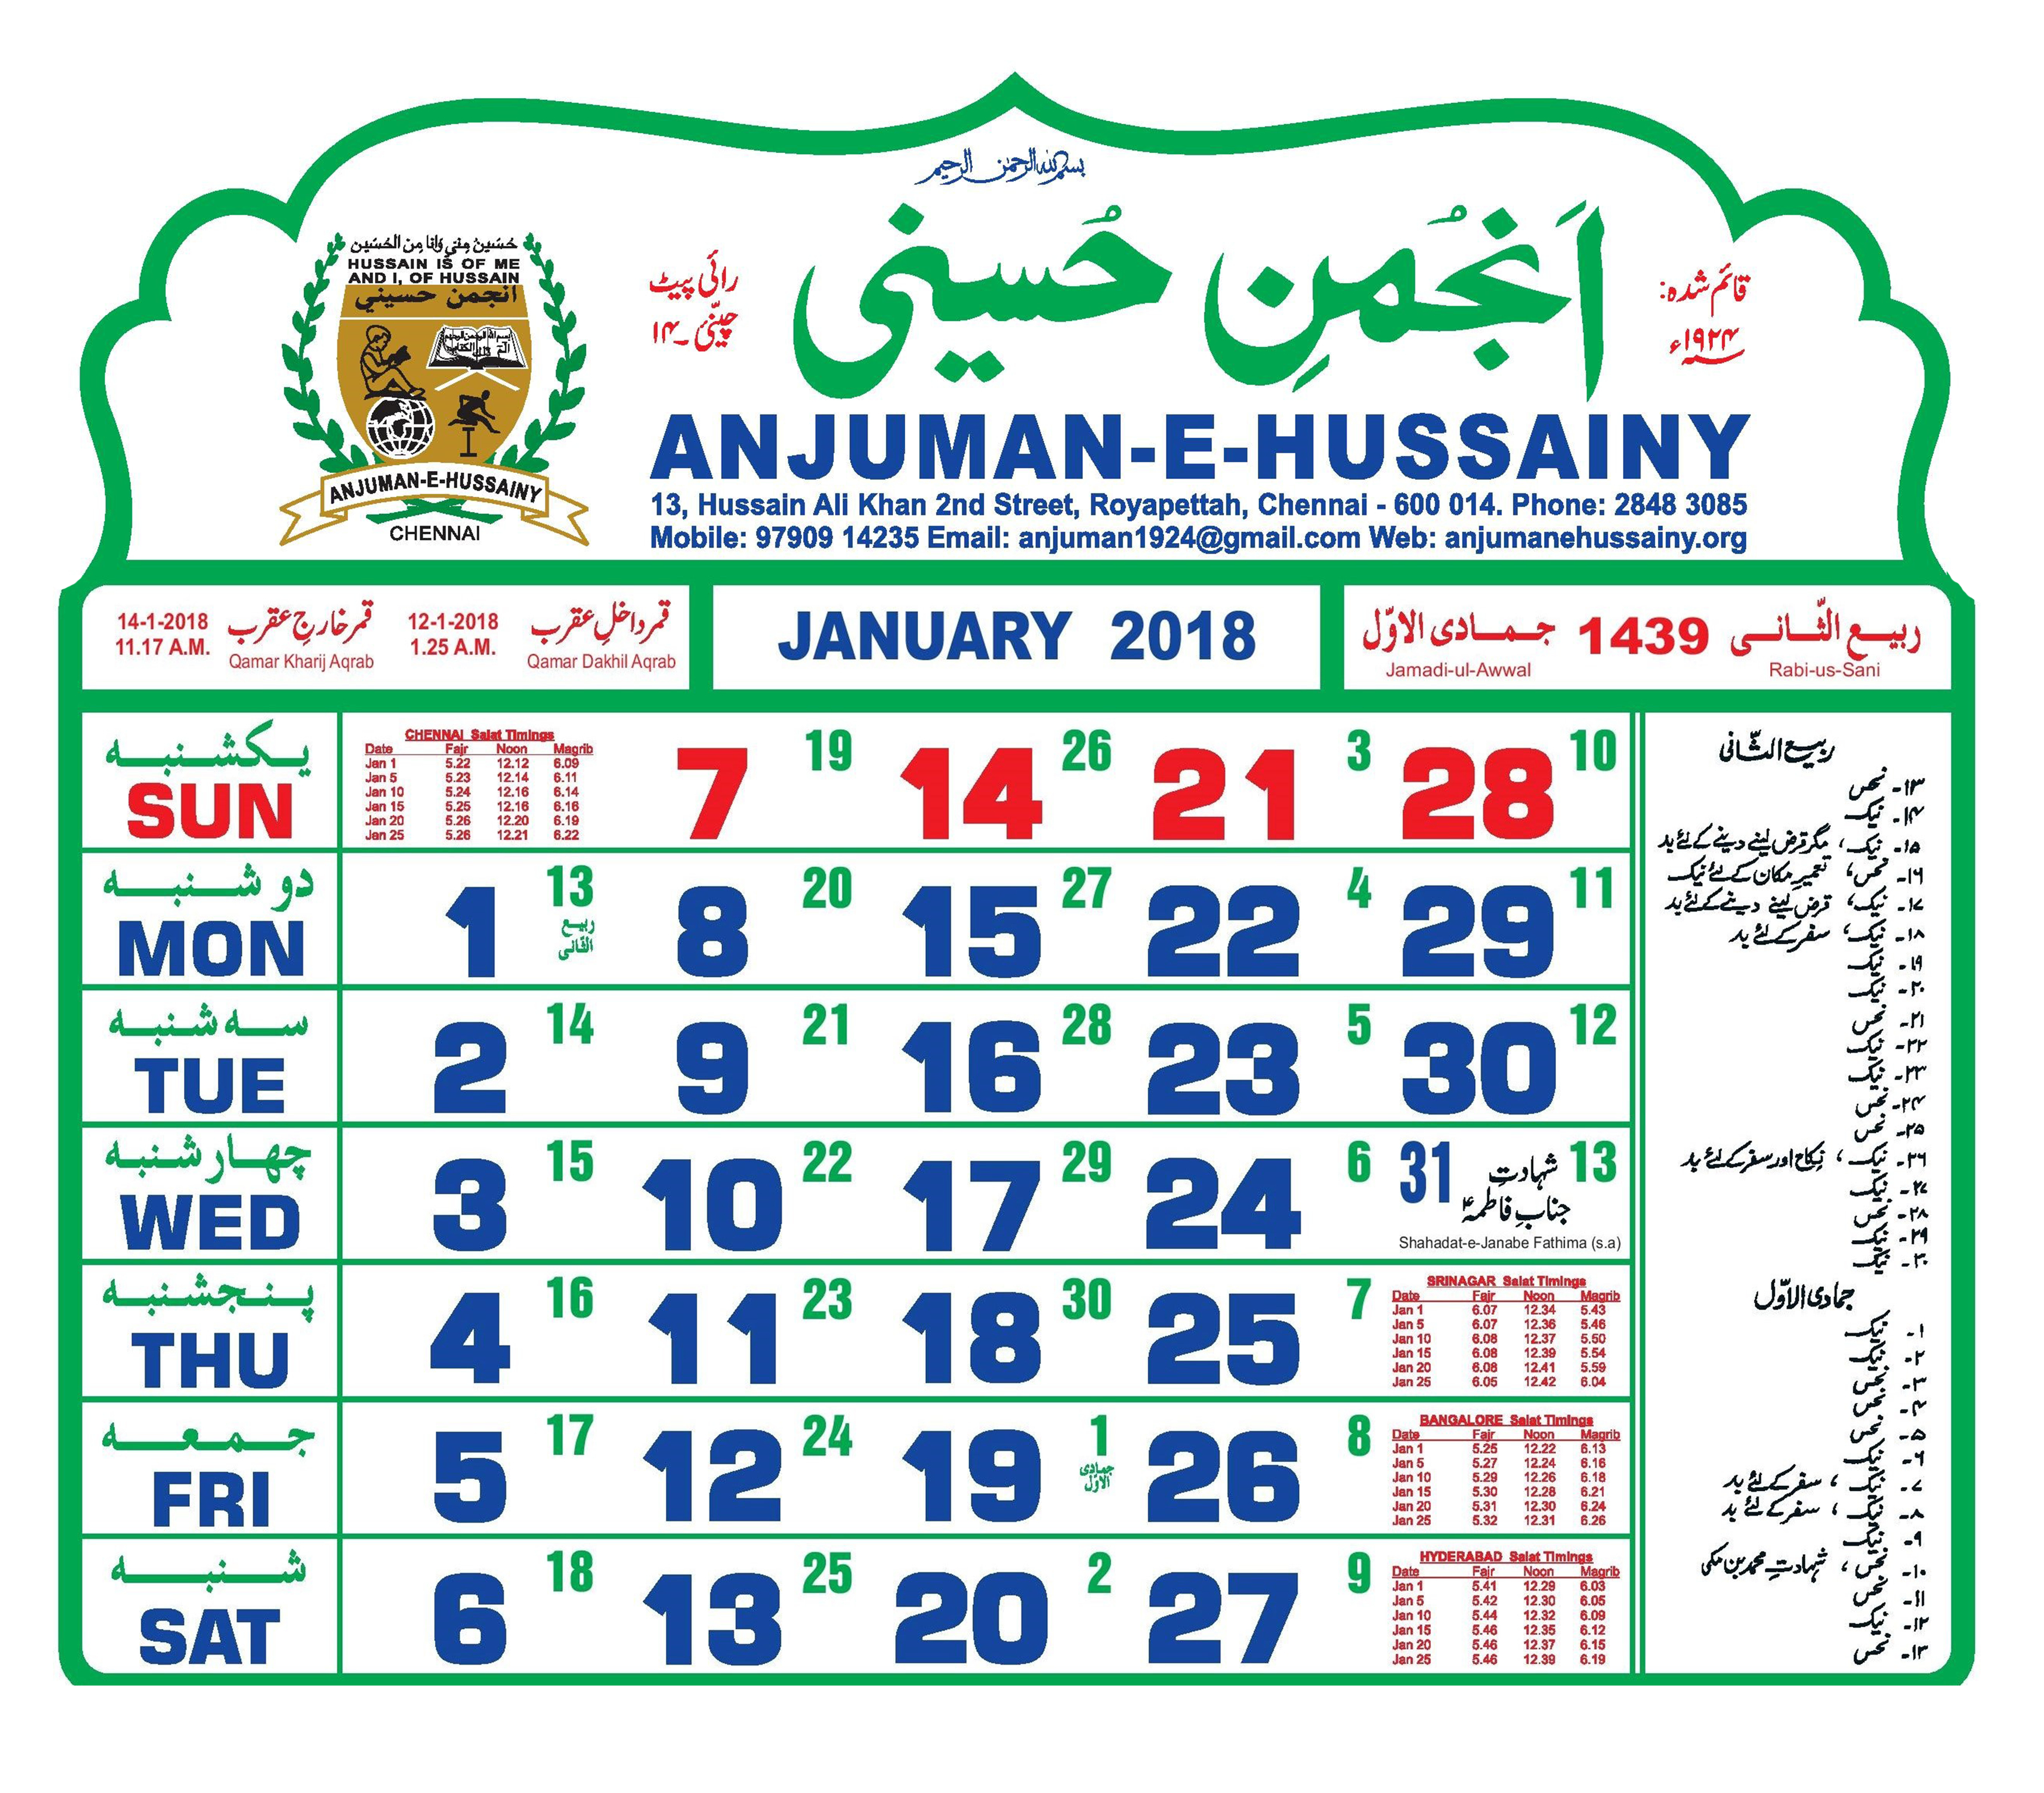 Yaad E Hussain — Ya Imam Hussain - Yaad E Hussain throughout Hussaini Calendar 2018